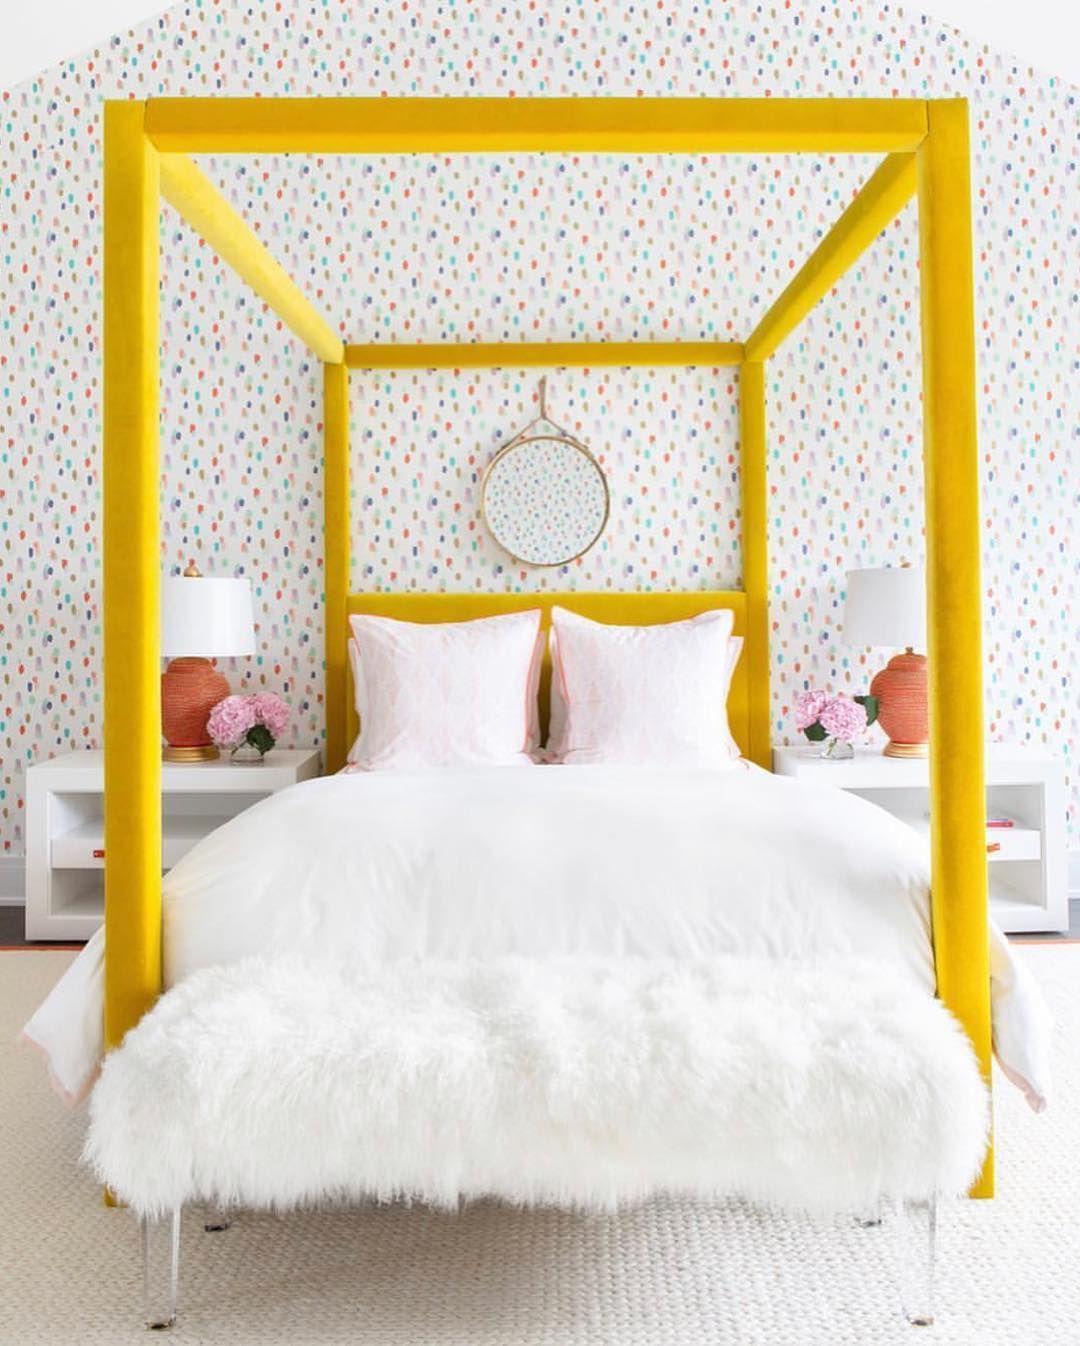 Unbelievable 11 Beegcom Best Furniture Selling App, Racing Art Home Decor #estilo #christmasspirit #homedecorloversfamilytangerang